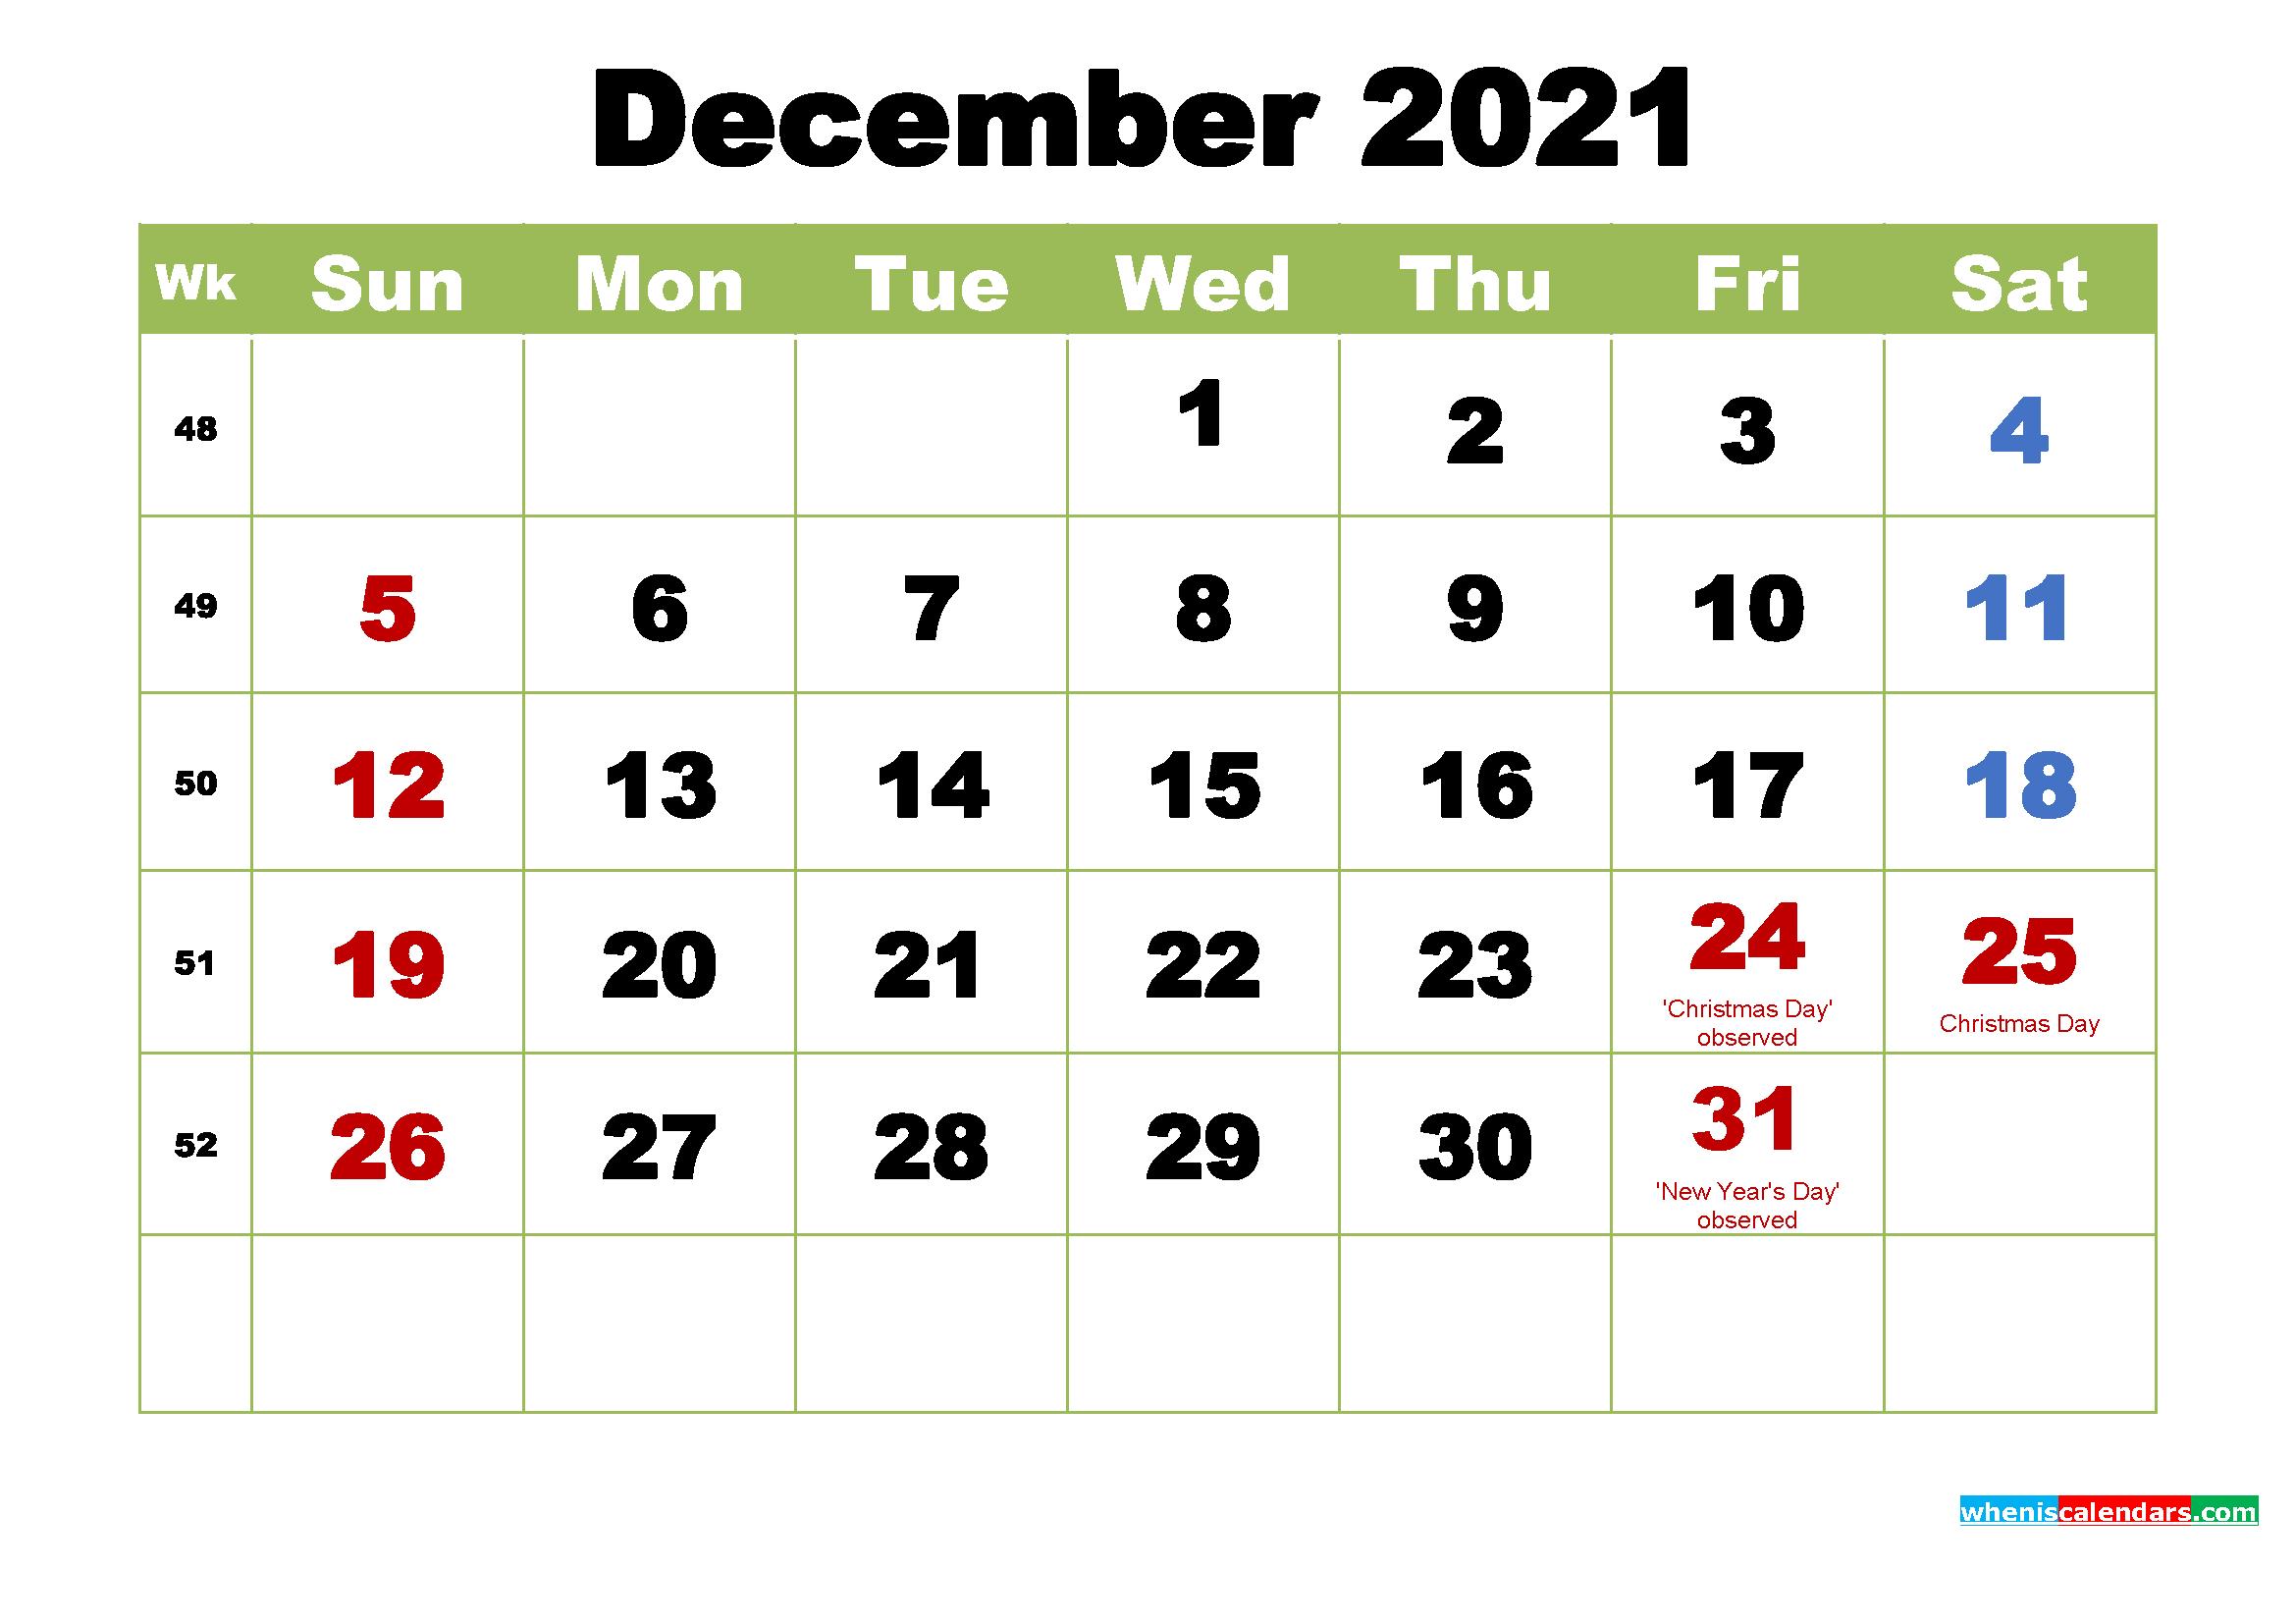 December 2021 Desktop Calendar With Holidays